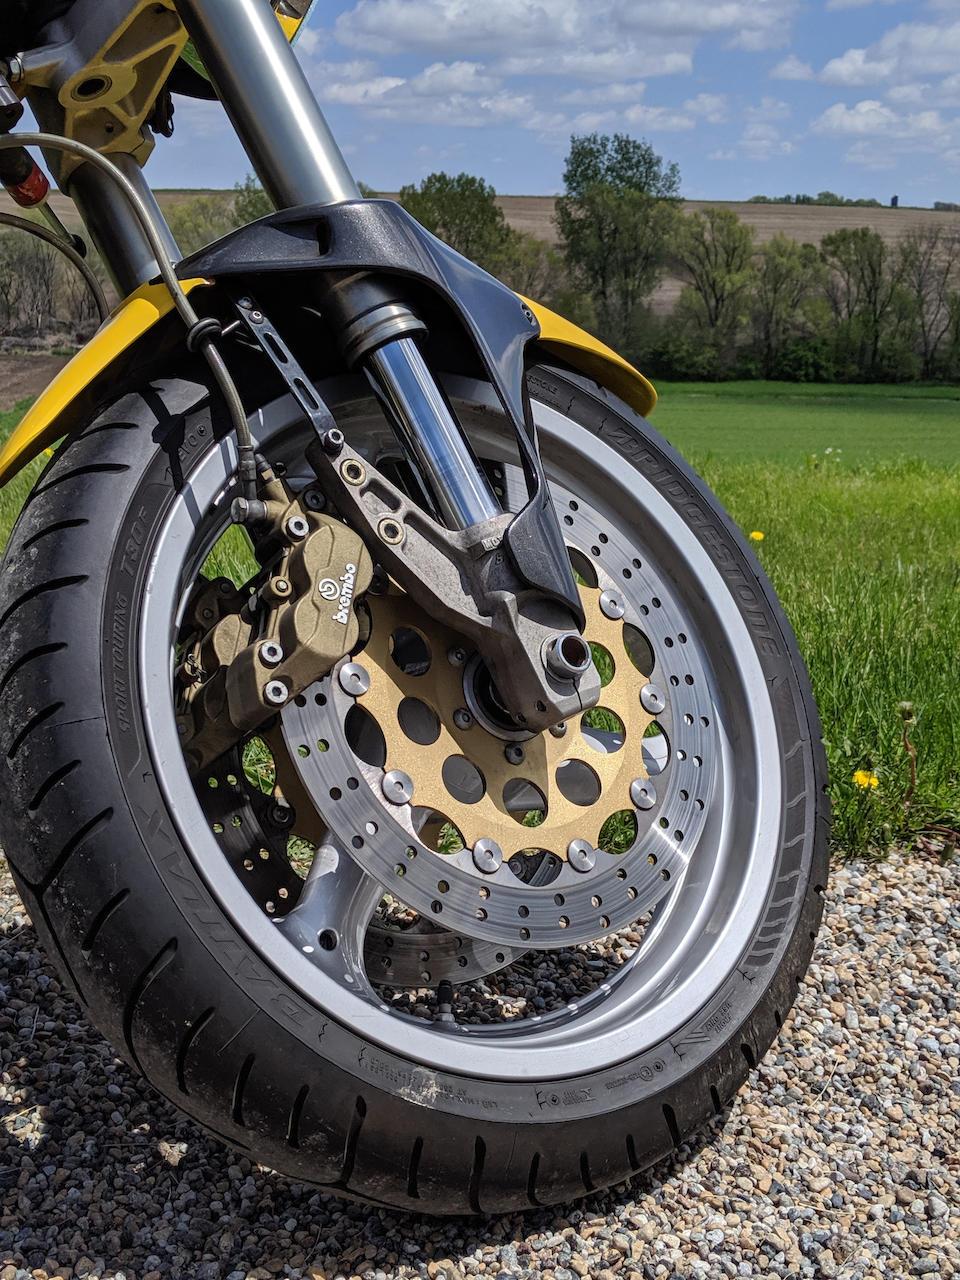 1998 Moto Guzzi 992cc V10 Centauro GT Frame no. ZGUKKAKK3WM112880 Engine no. KK 012841